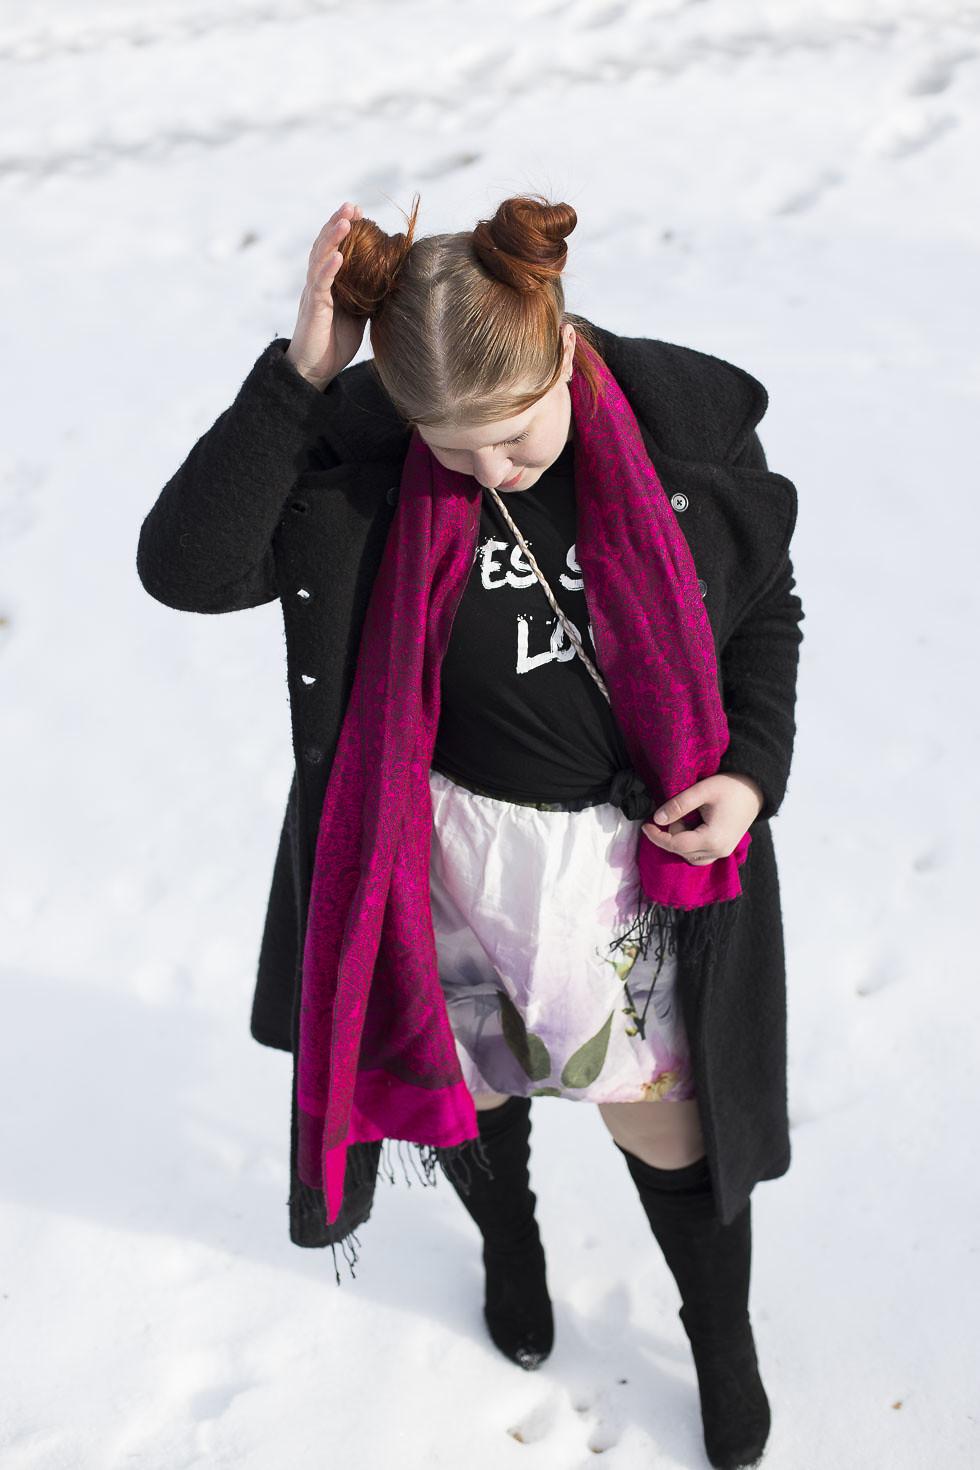 Tyyliblogi-Pohjois-Karjala